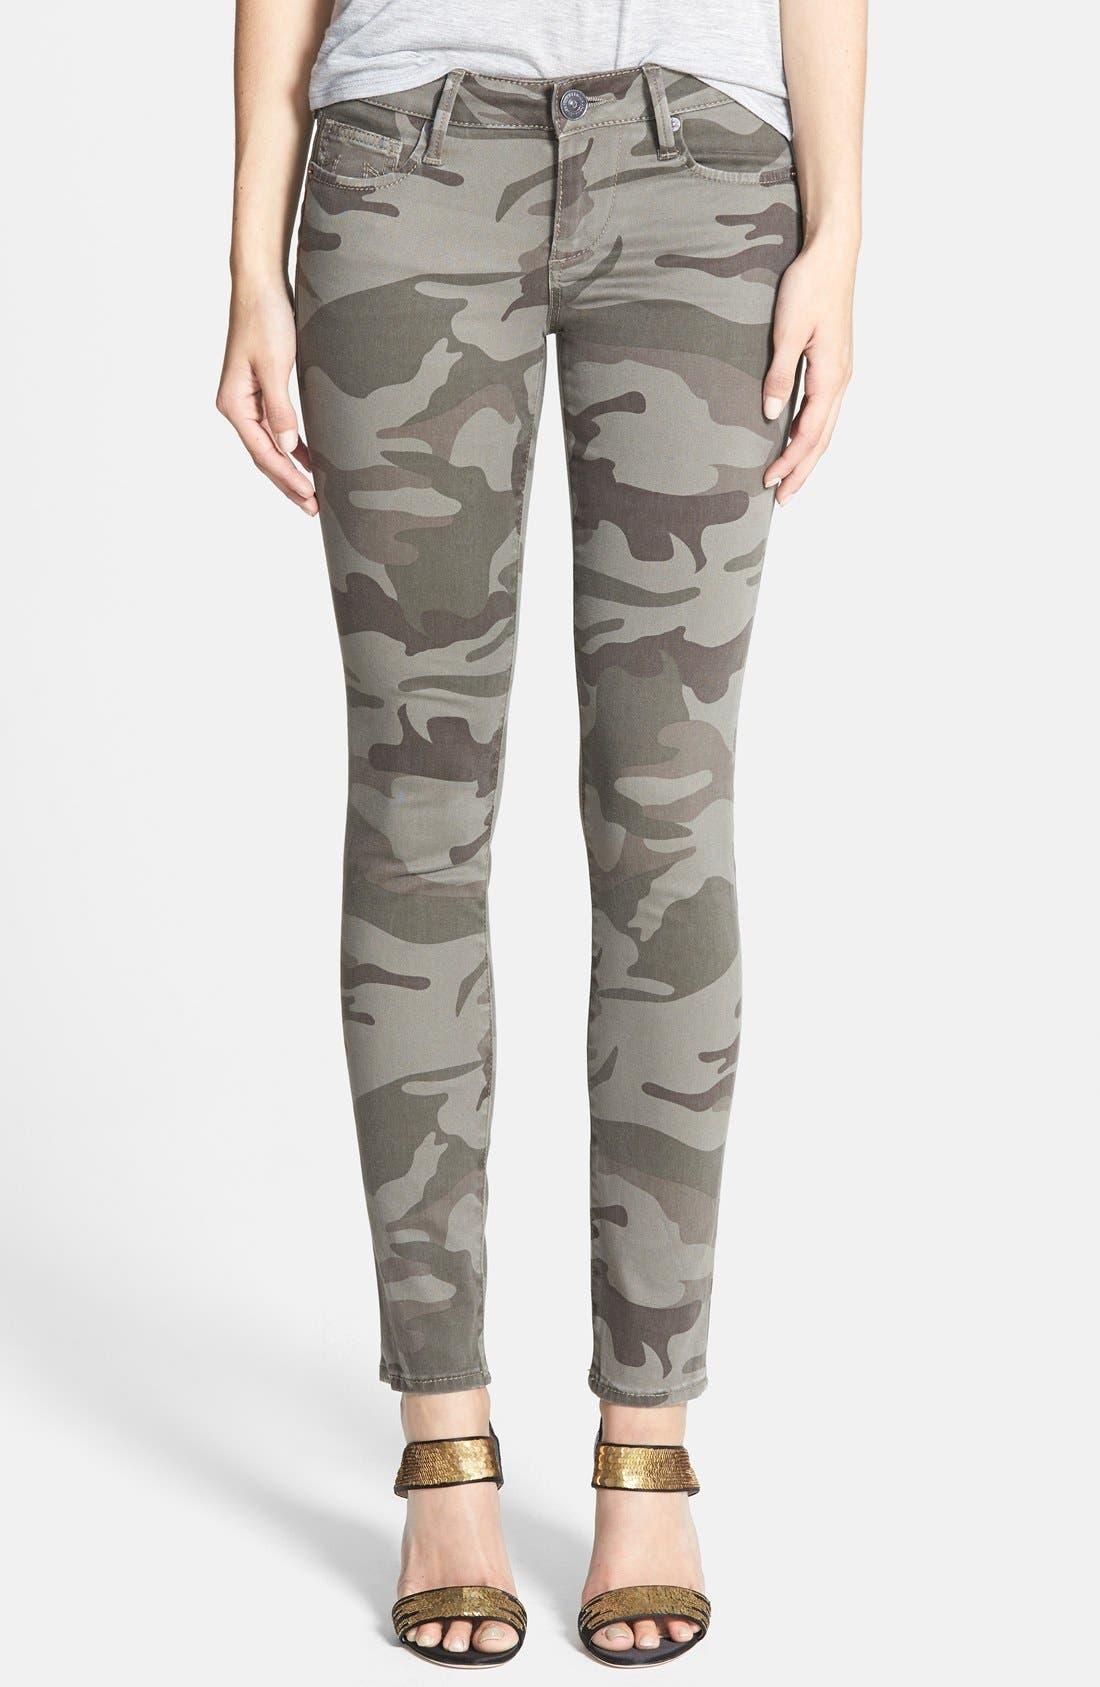 Main Image - True Religion Brand Jeans Casey Print Super Skinny Jeans (Olive Camo)